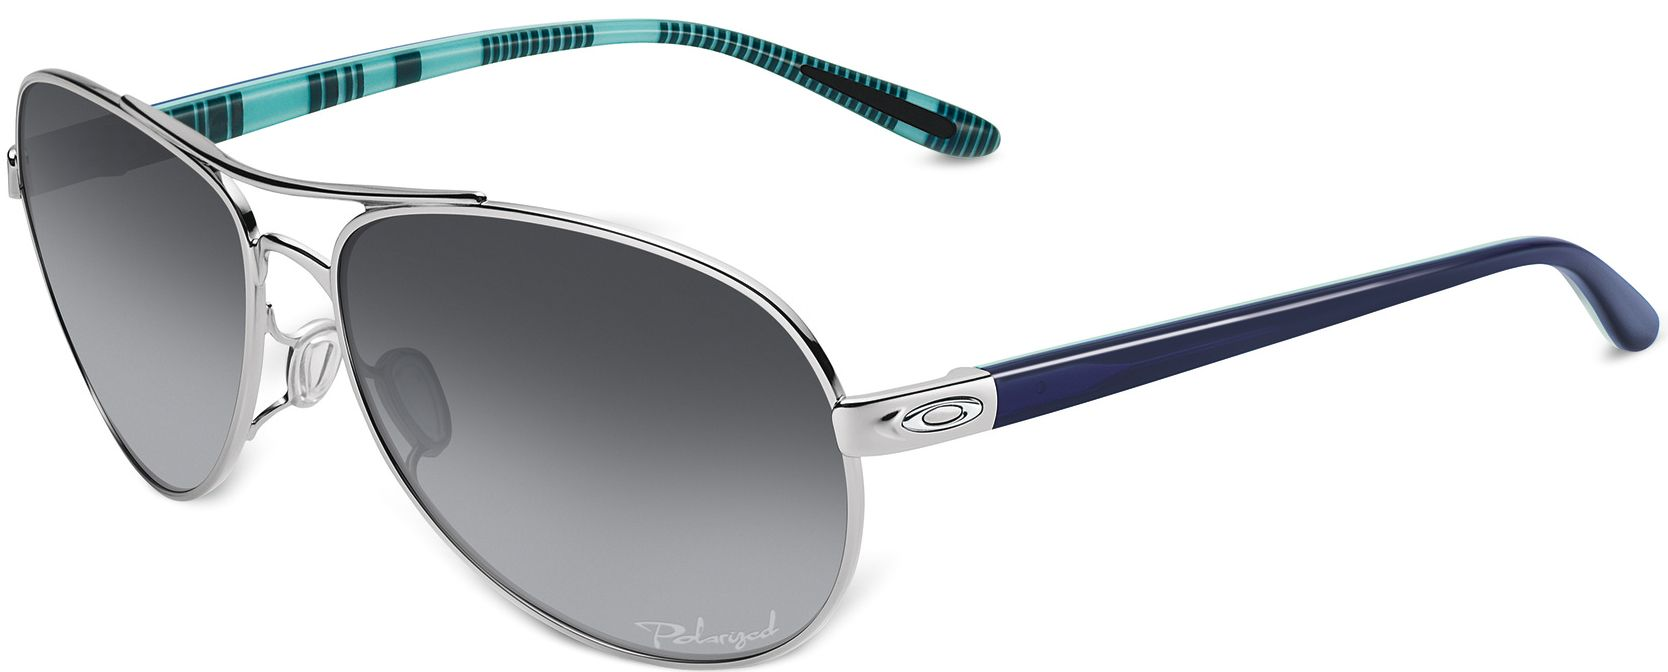 oakley womens feedback polarized sunglasses